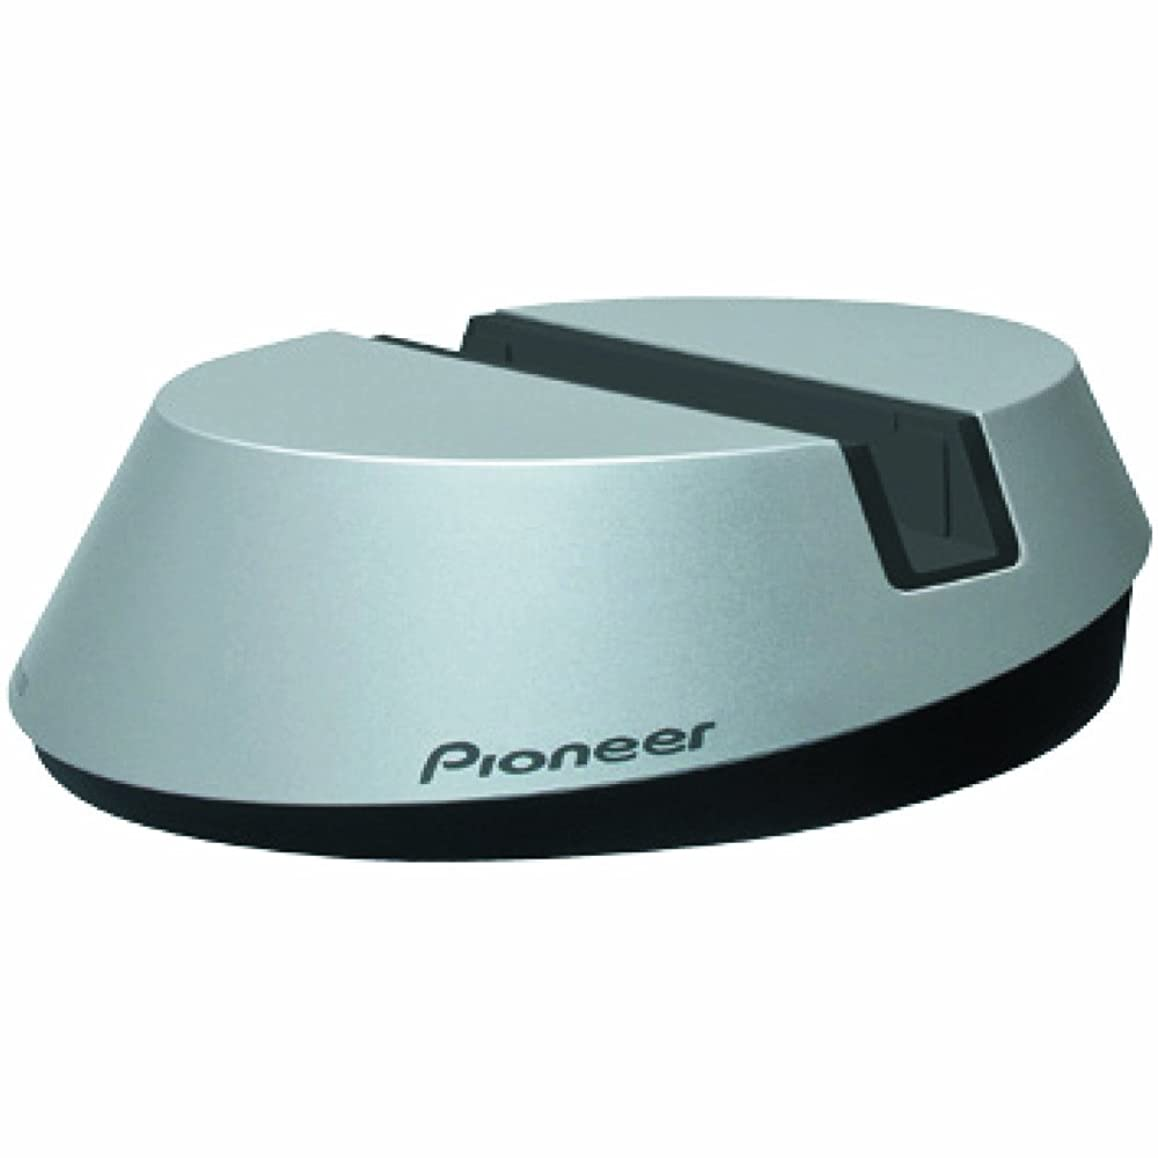 Pioneer パイオニア iPhone&外付ドライブ&USB機器用 無線LAN(IEEE802.11a/b/g/n)対応ワイヤレスドック APS-WF01J-2